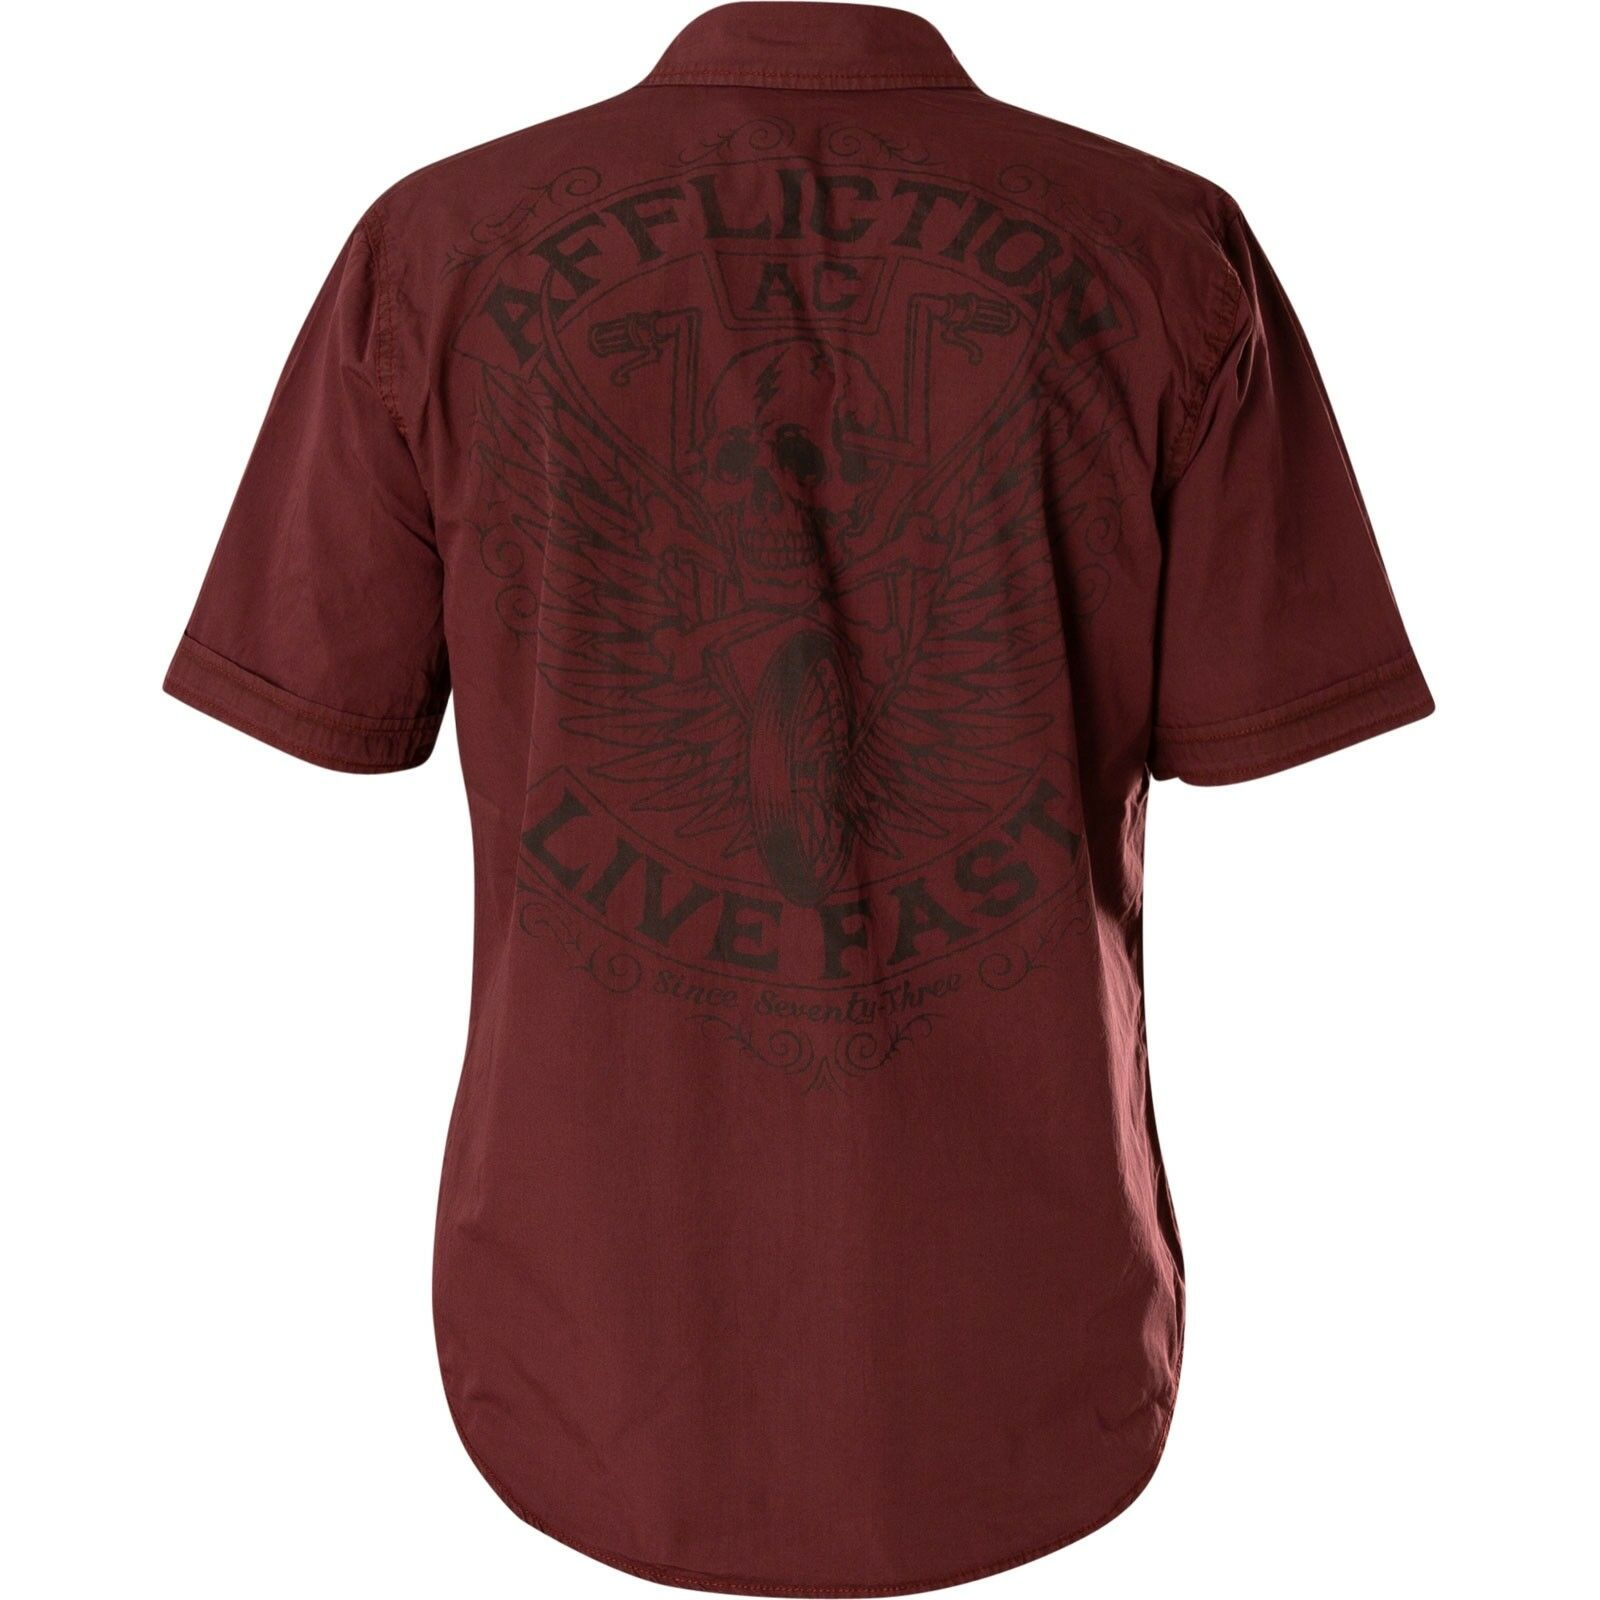 Affliction Camicia Territorial camicie camicie camicie Rosso Vinaccia 376812